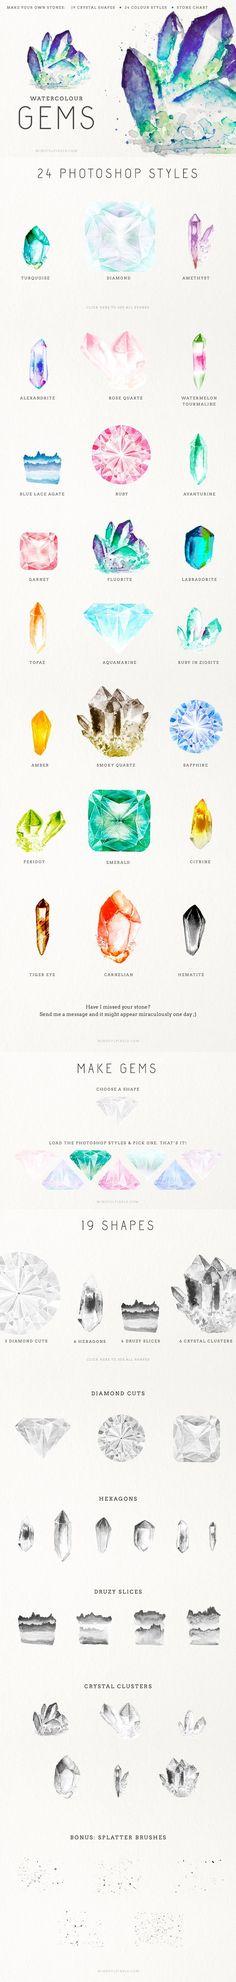 Gem Creator Kit Watercolor Crystal Clusters Clip Art Wedding Invitation Pocket Scrapbooking / Project Life / Journaling / Memory Keeping